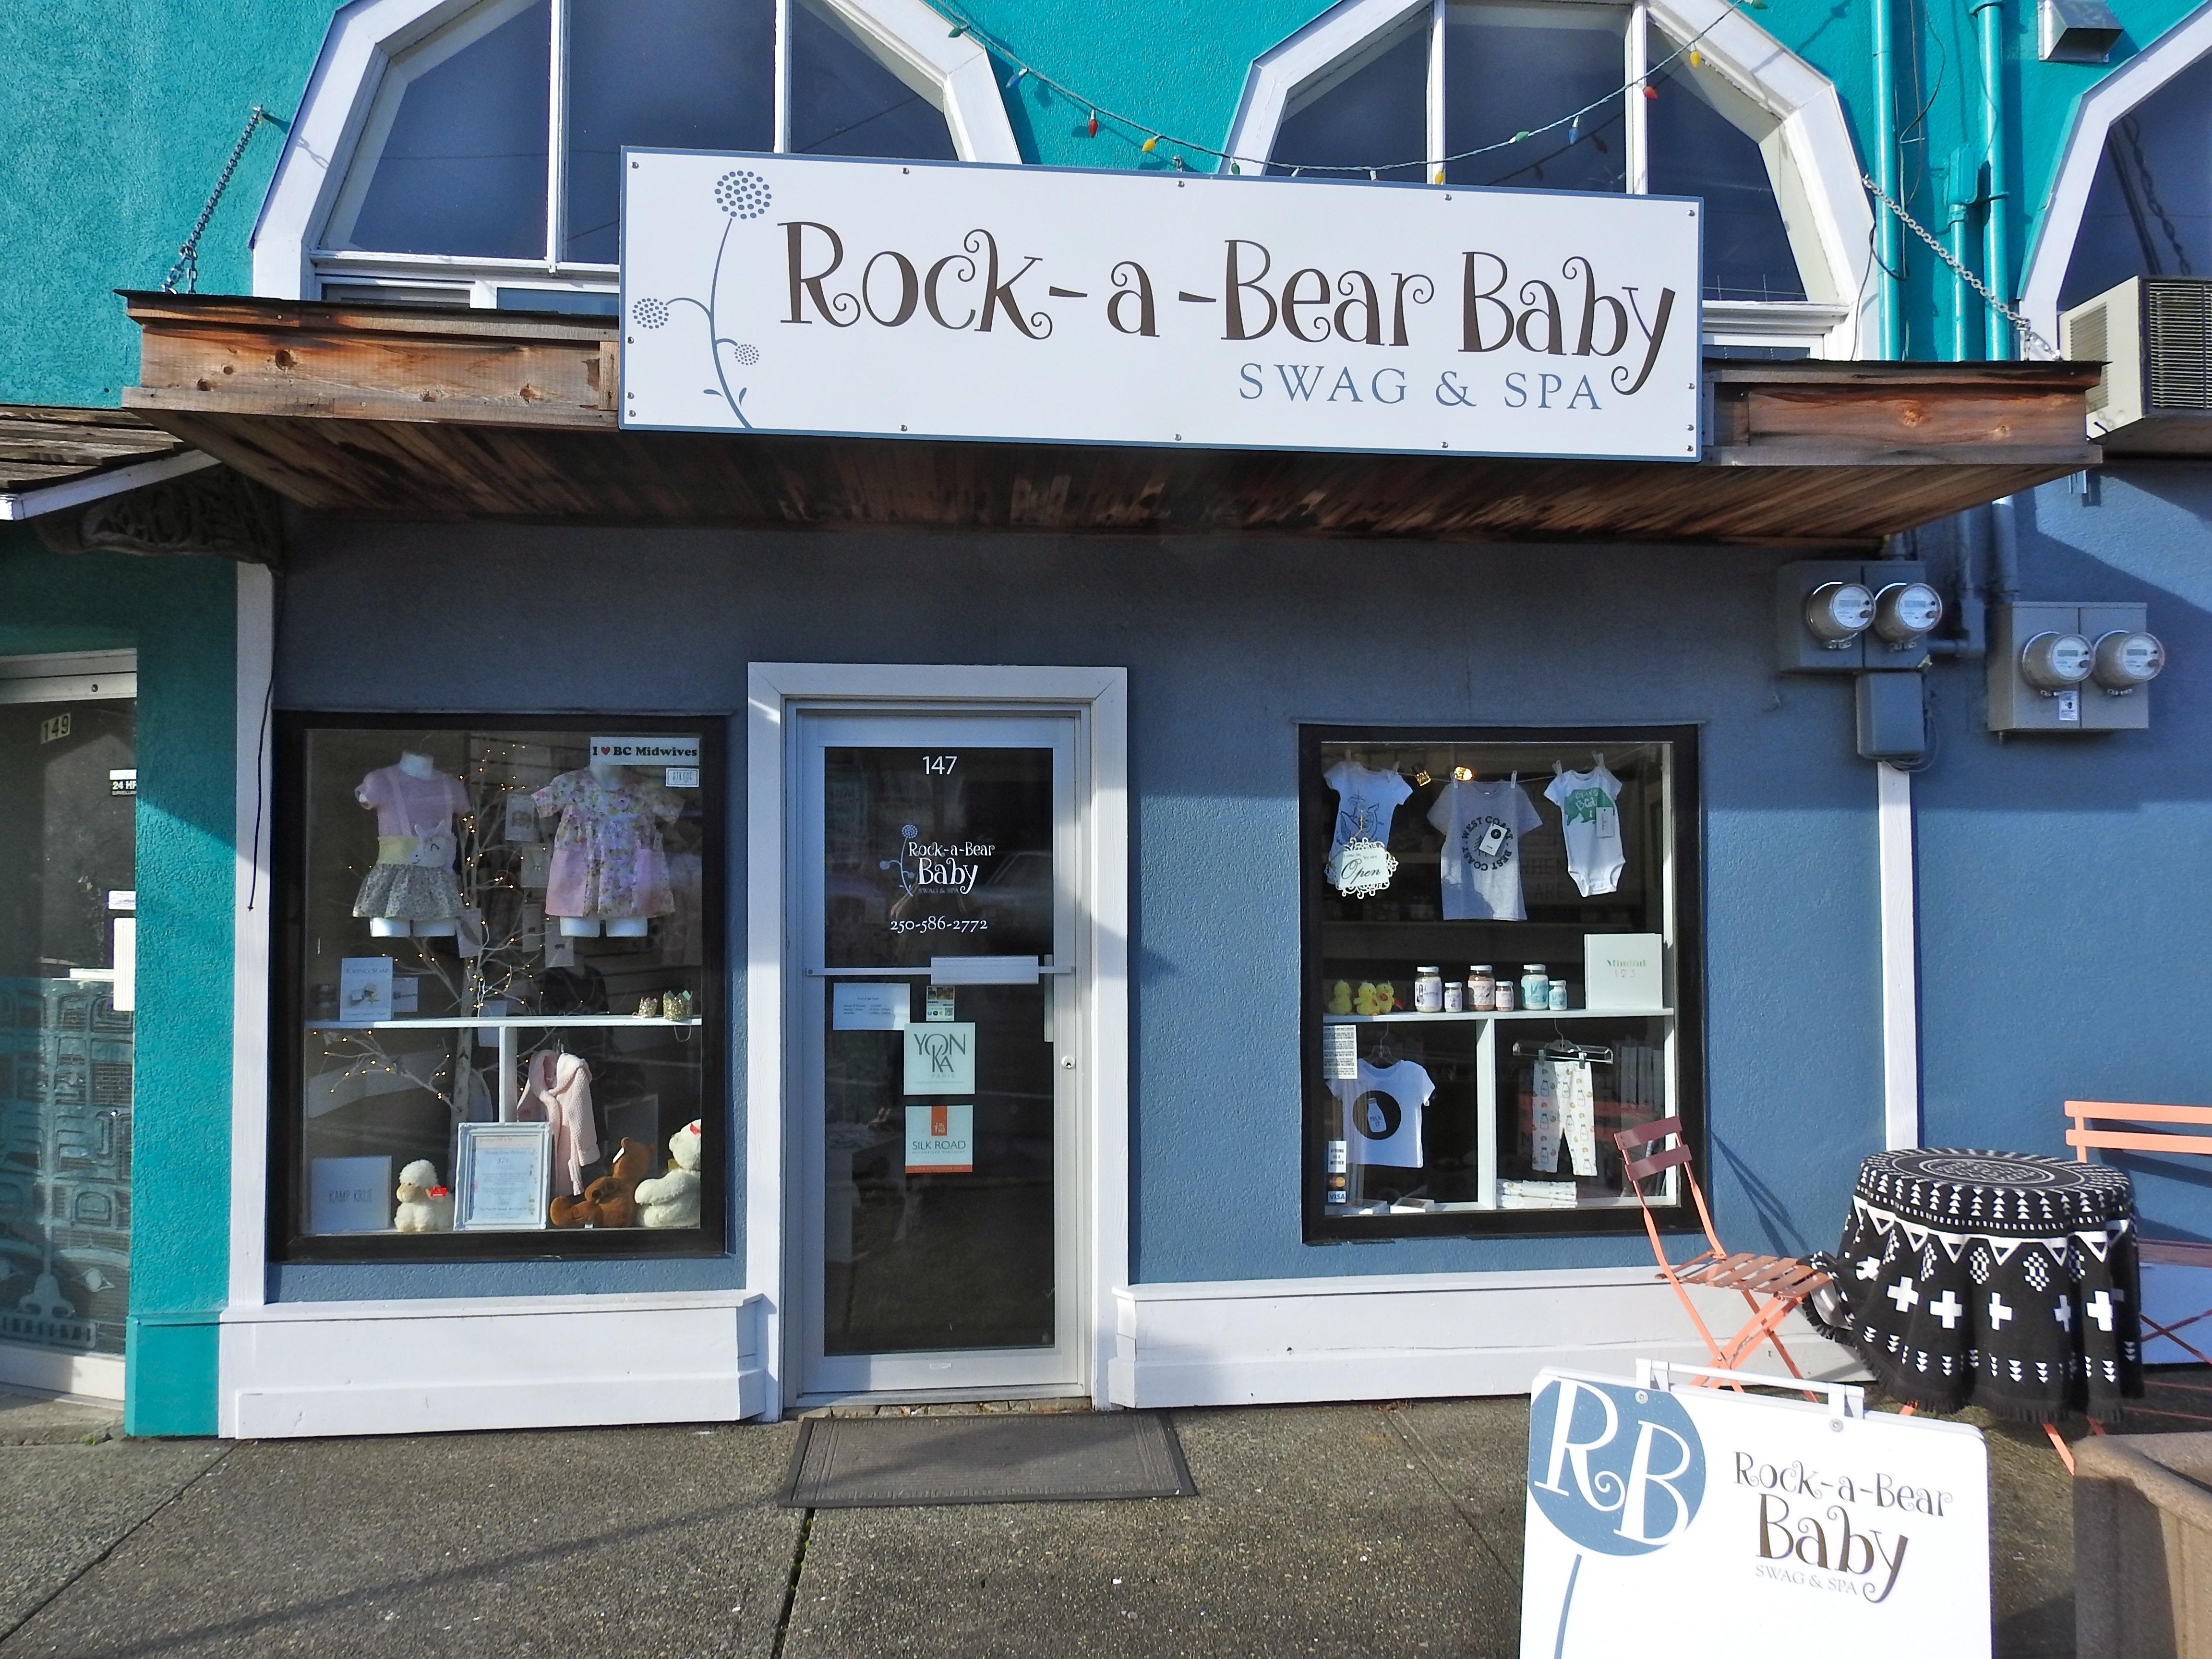 Rock-A-Bear Baby Swag & Spa